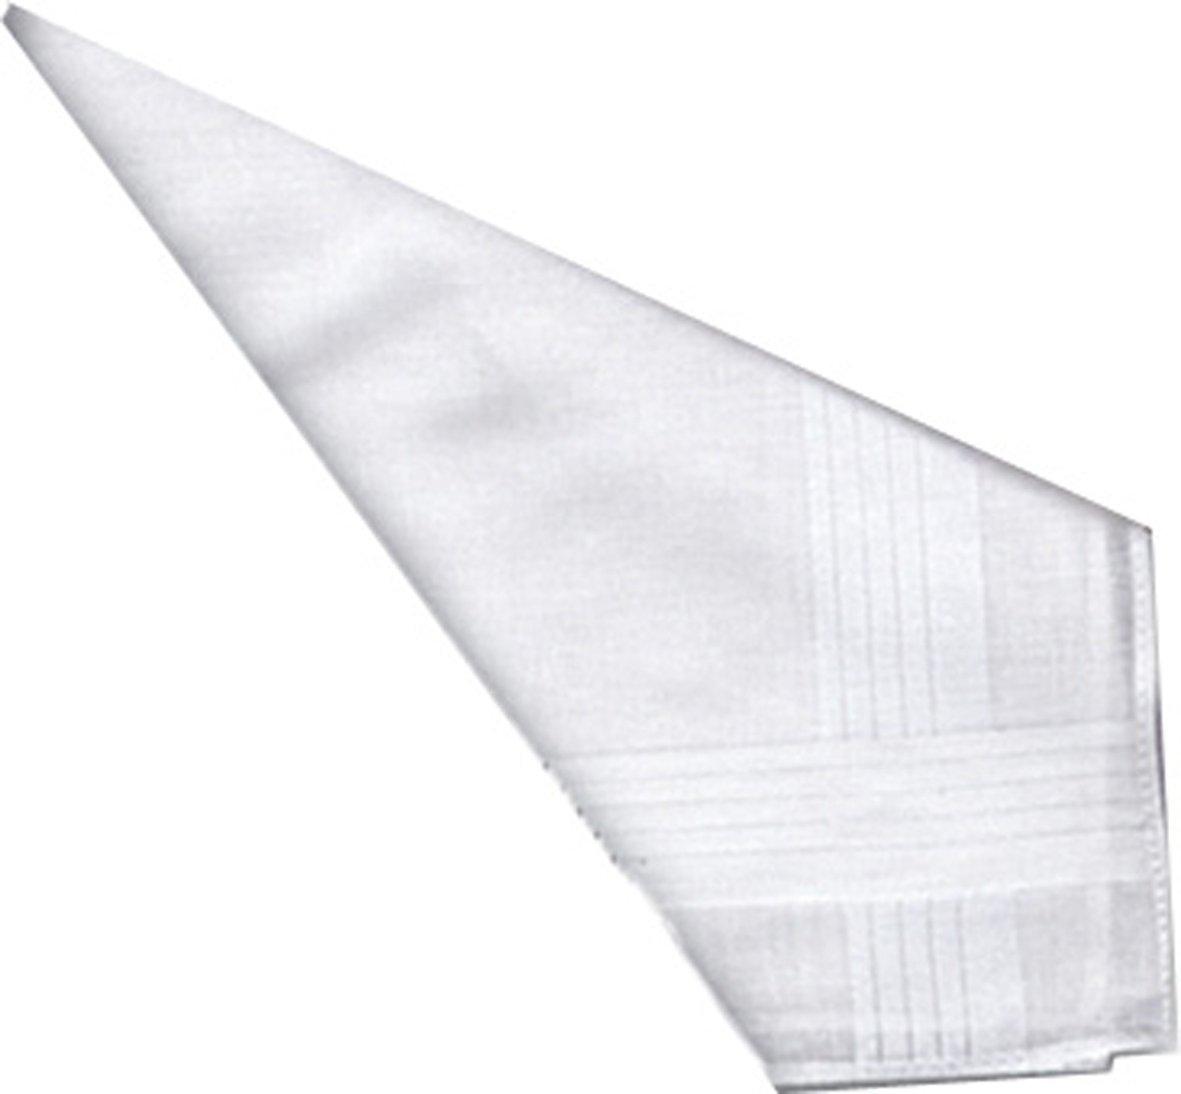 DuDu N Girlie Satin Bordüre Herren 100% Baumwolle Taschentuch, 40cm x 40cm, 12-teilig 40cm x 40cm Dudu N Girlie Limited B003SRMNQQ